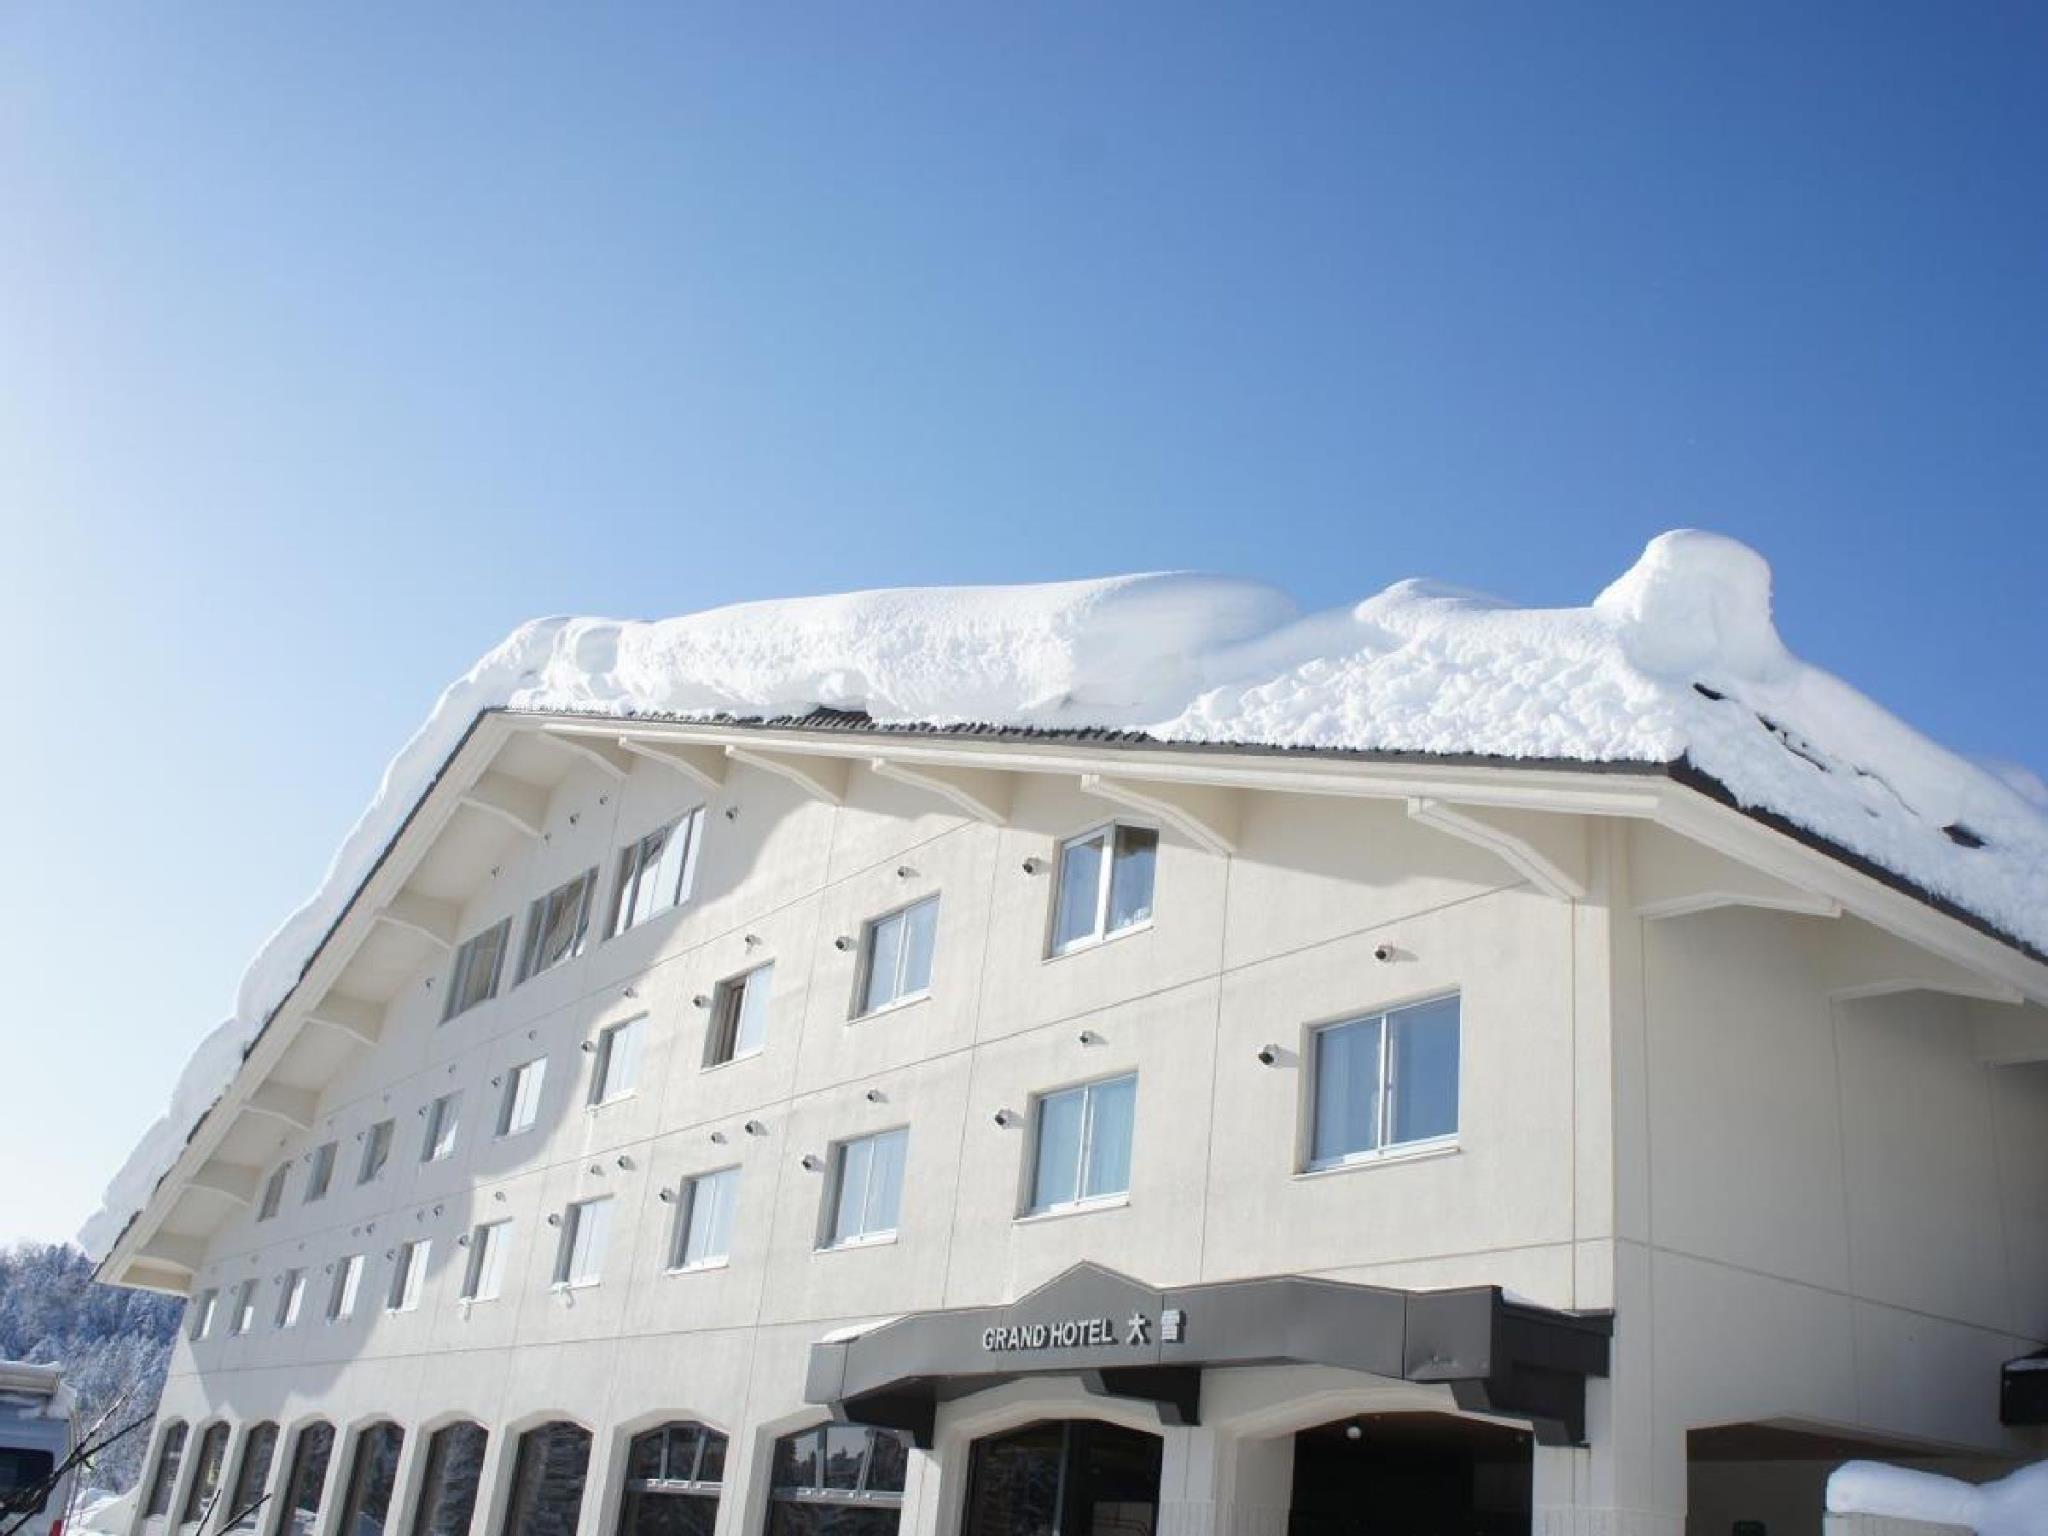 Asahidake Onsen Grand Hotel Daisetsu, Higashikawa